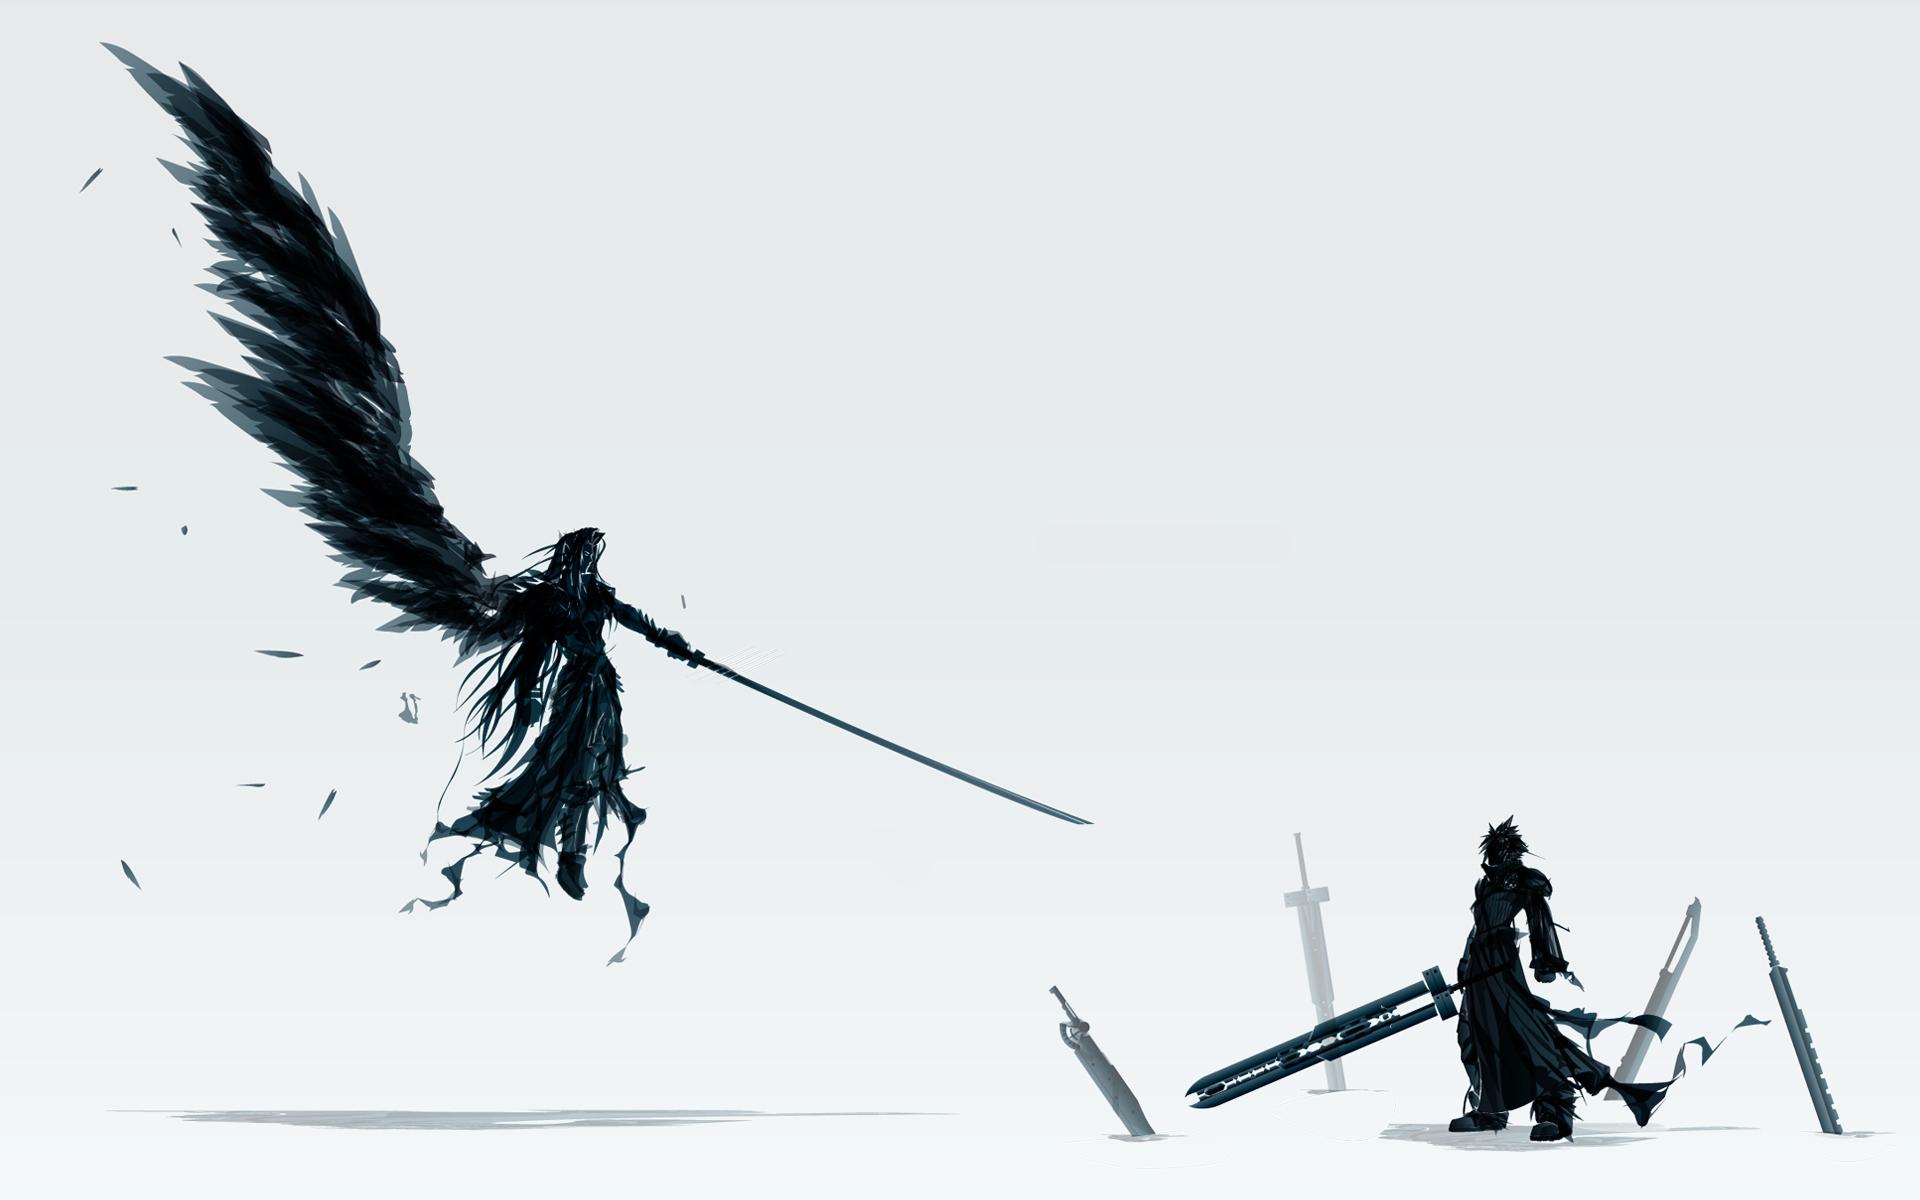 SephirothCloud   Final Fantasy VII Wallpaper 29026371 1920x1200